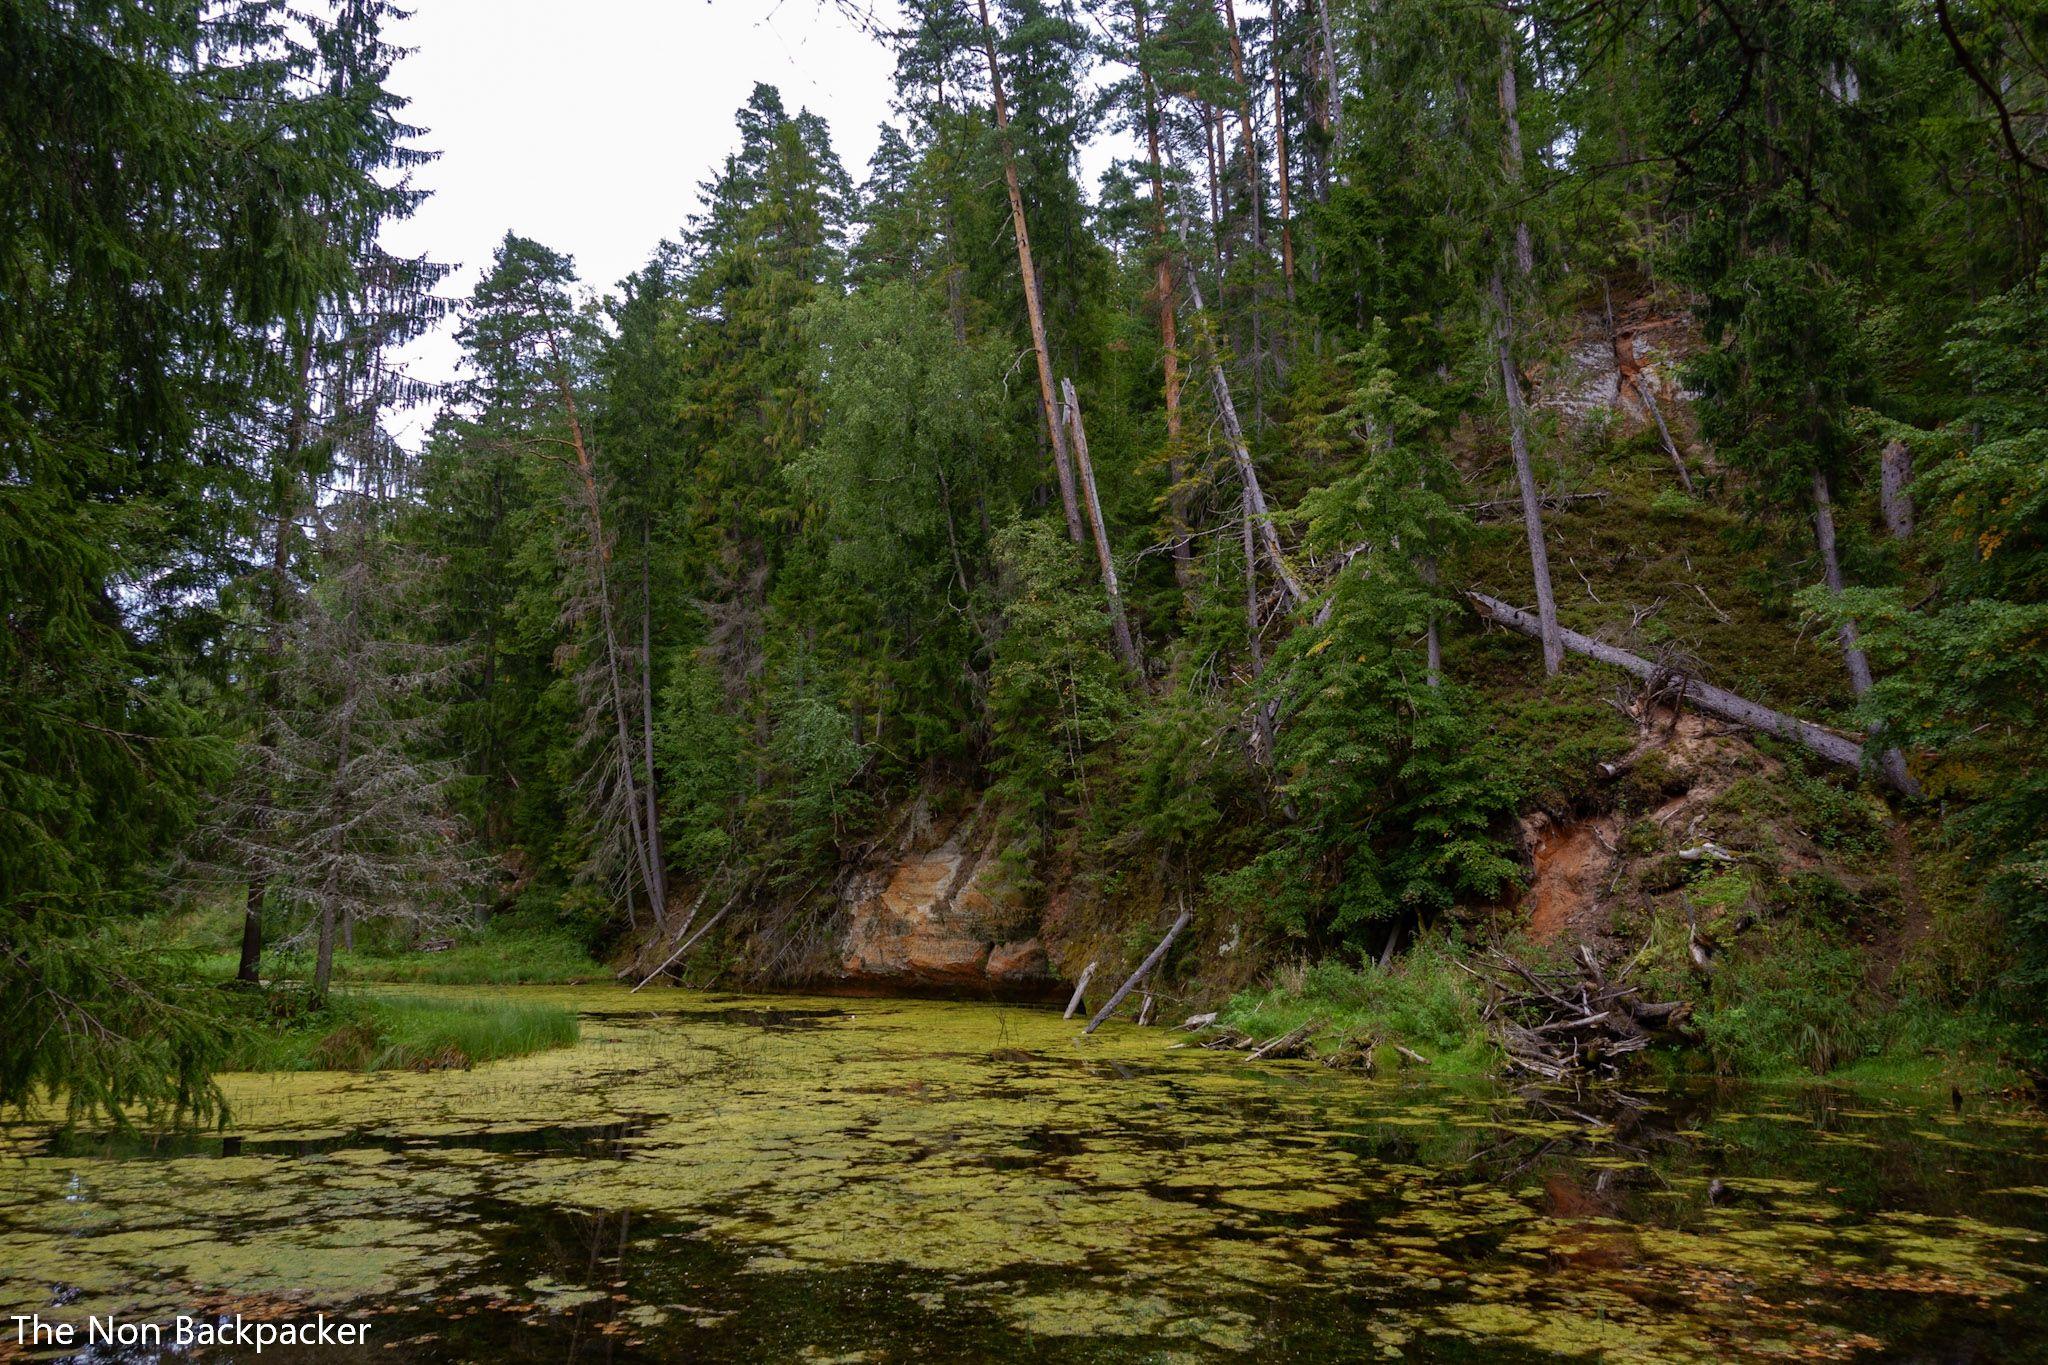 The Cirulisi Nature Trail